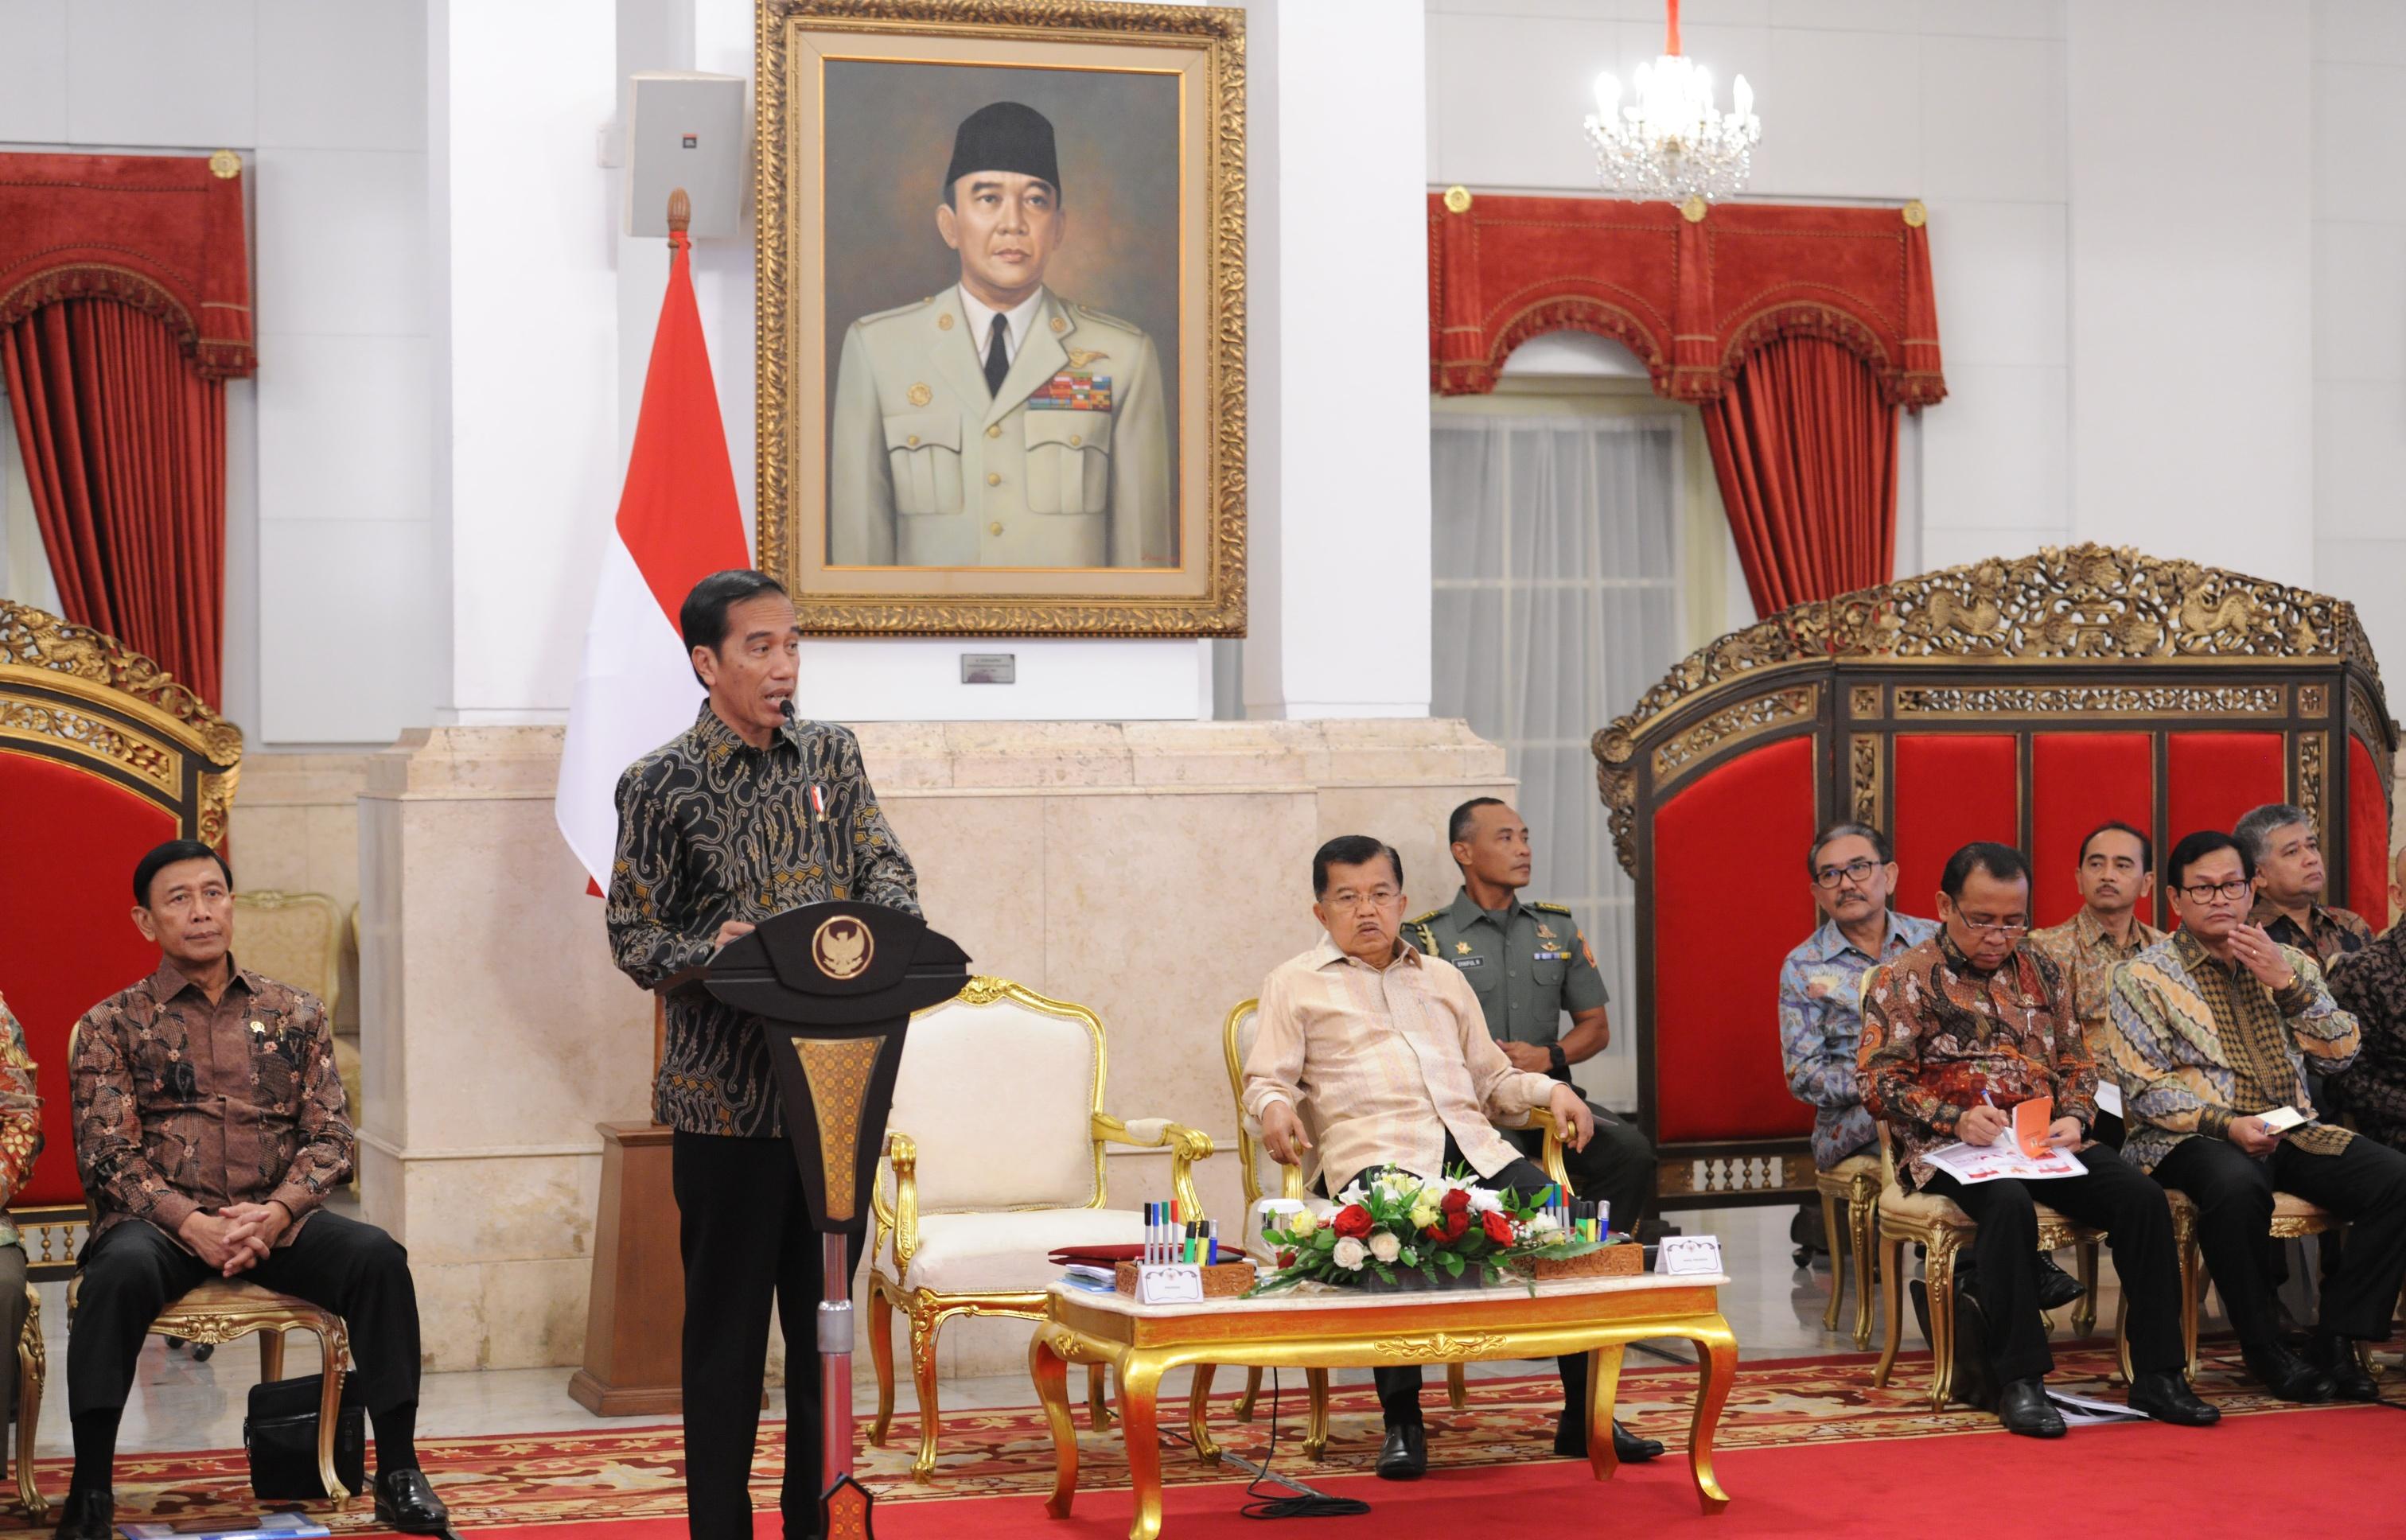 Hasil gambar untuk jokowi rapat paripurna kabinet di istana negara